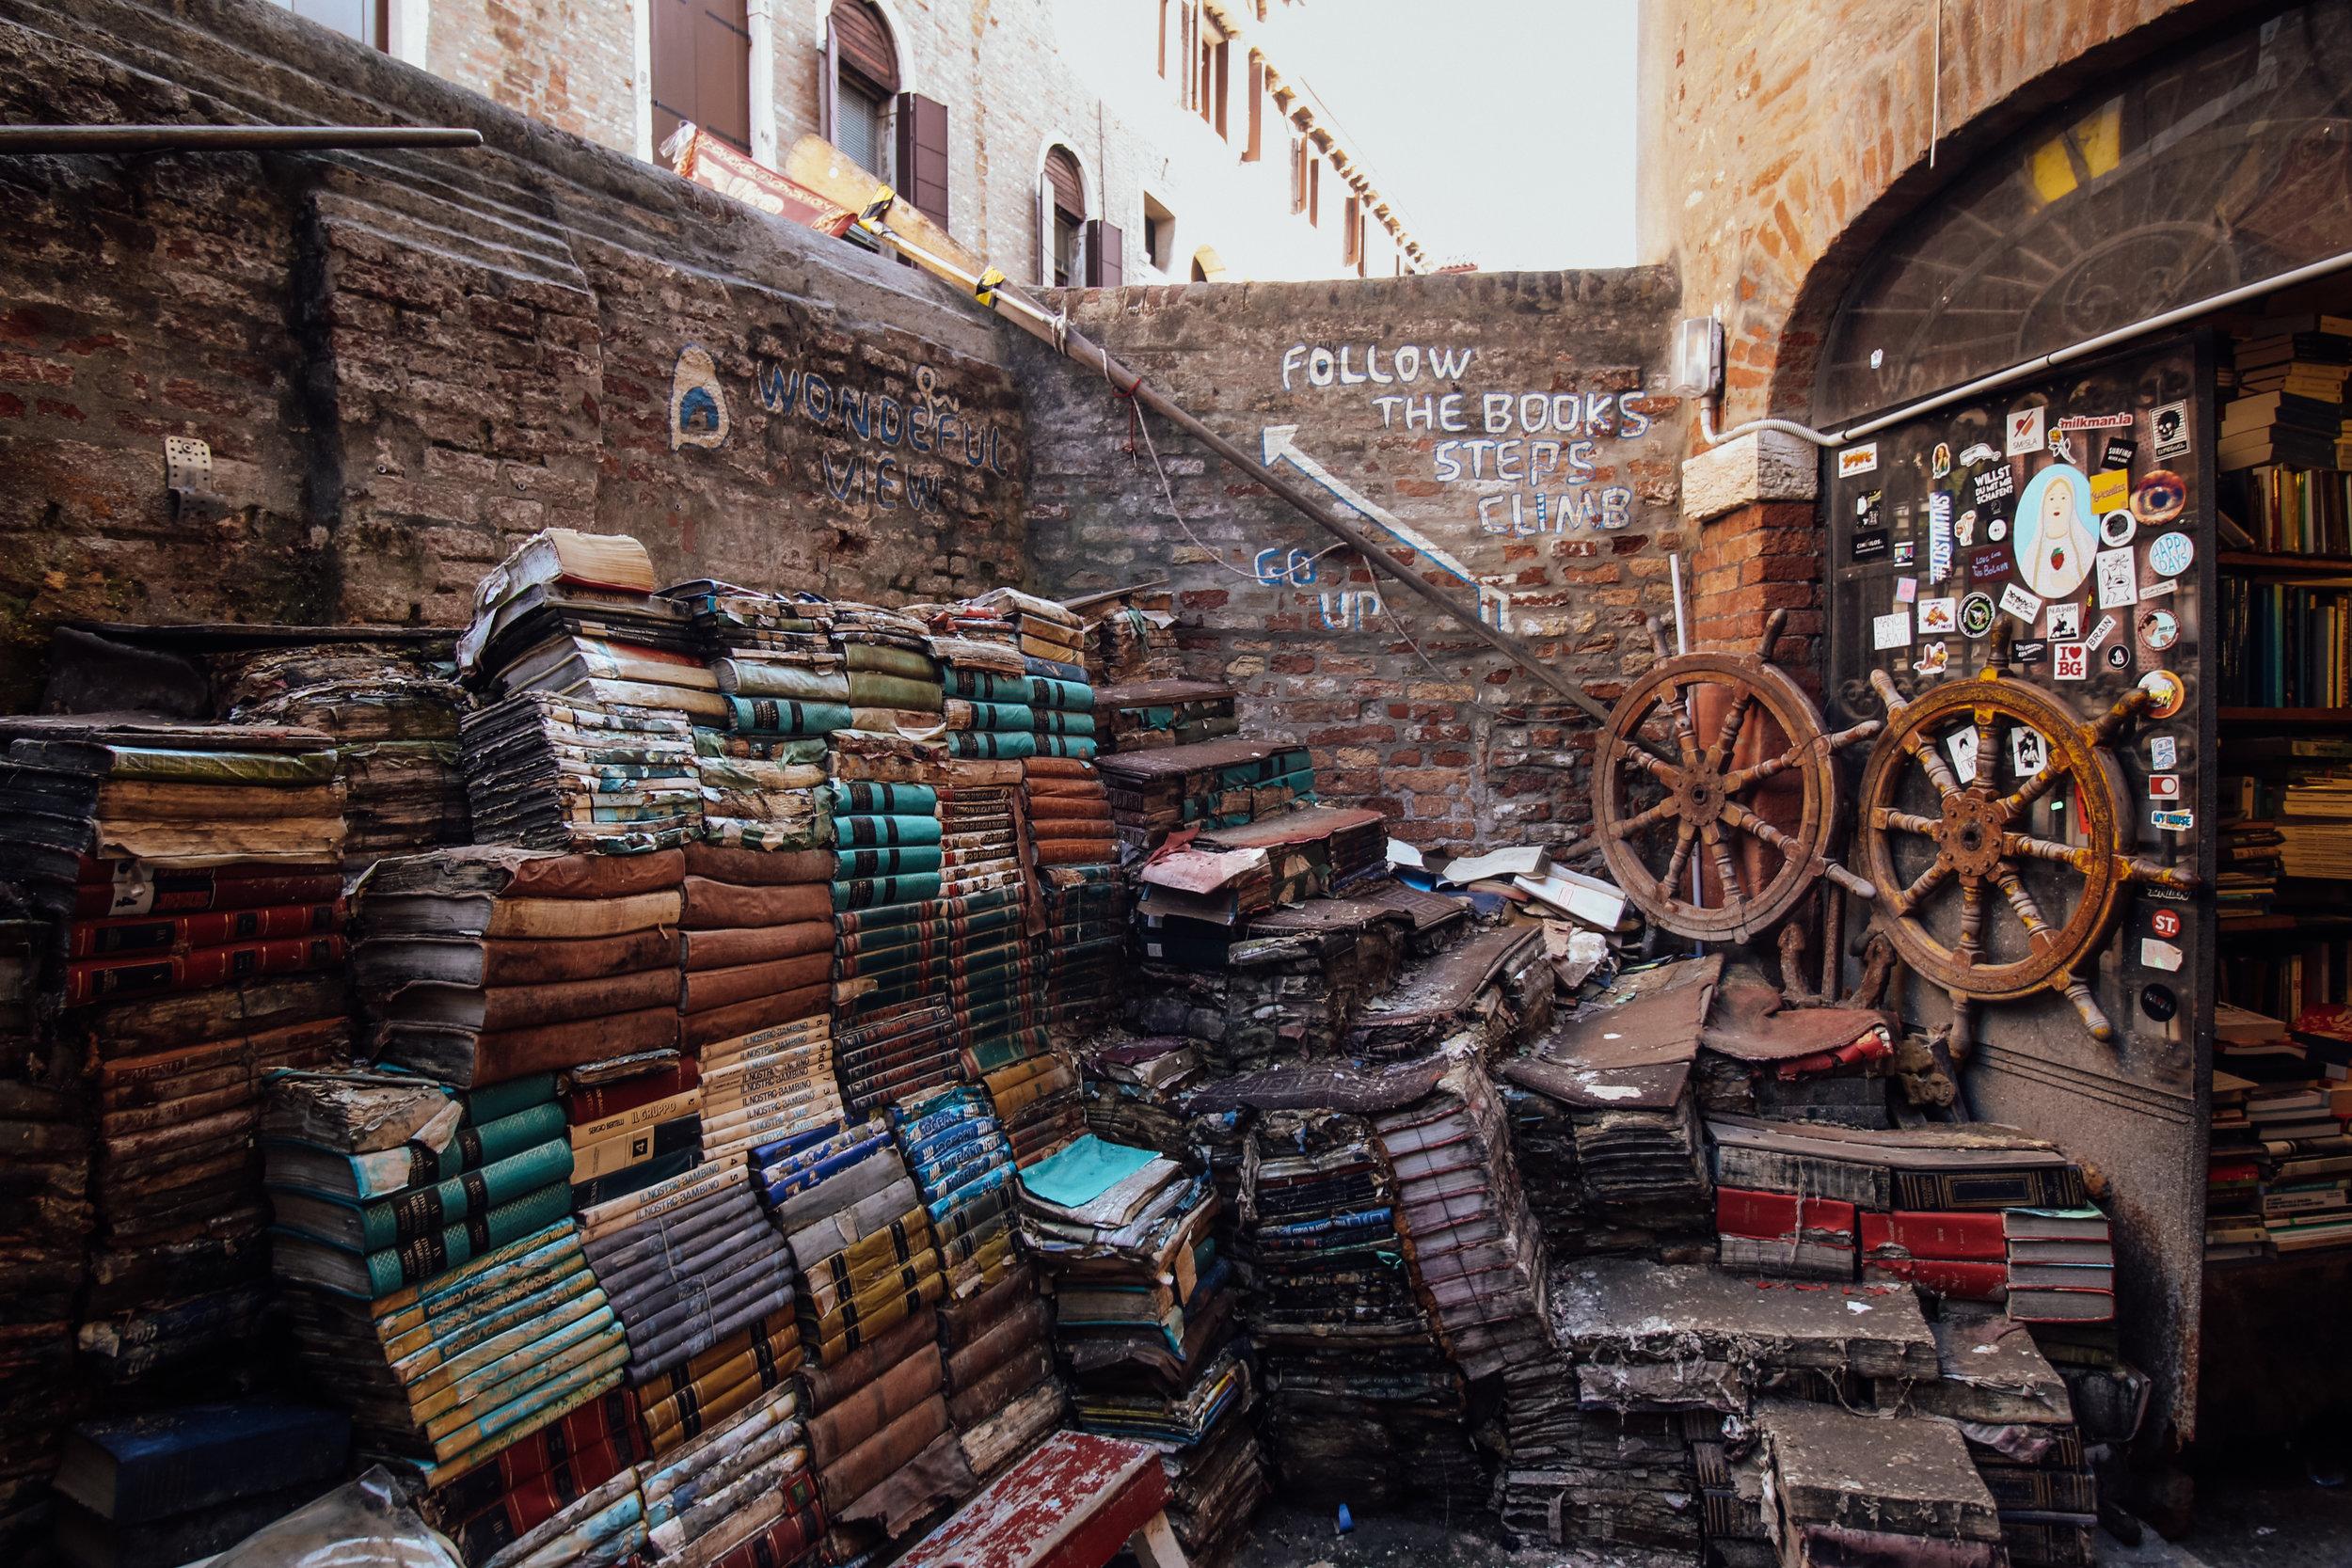 Libreria Acqua Alta: 10 Photos of Venice's Must-See Bookshop — Girl Gone  Abroad